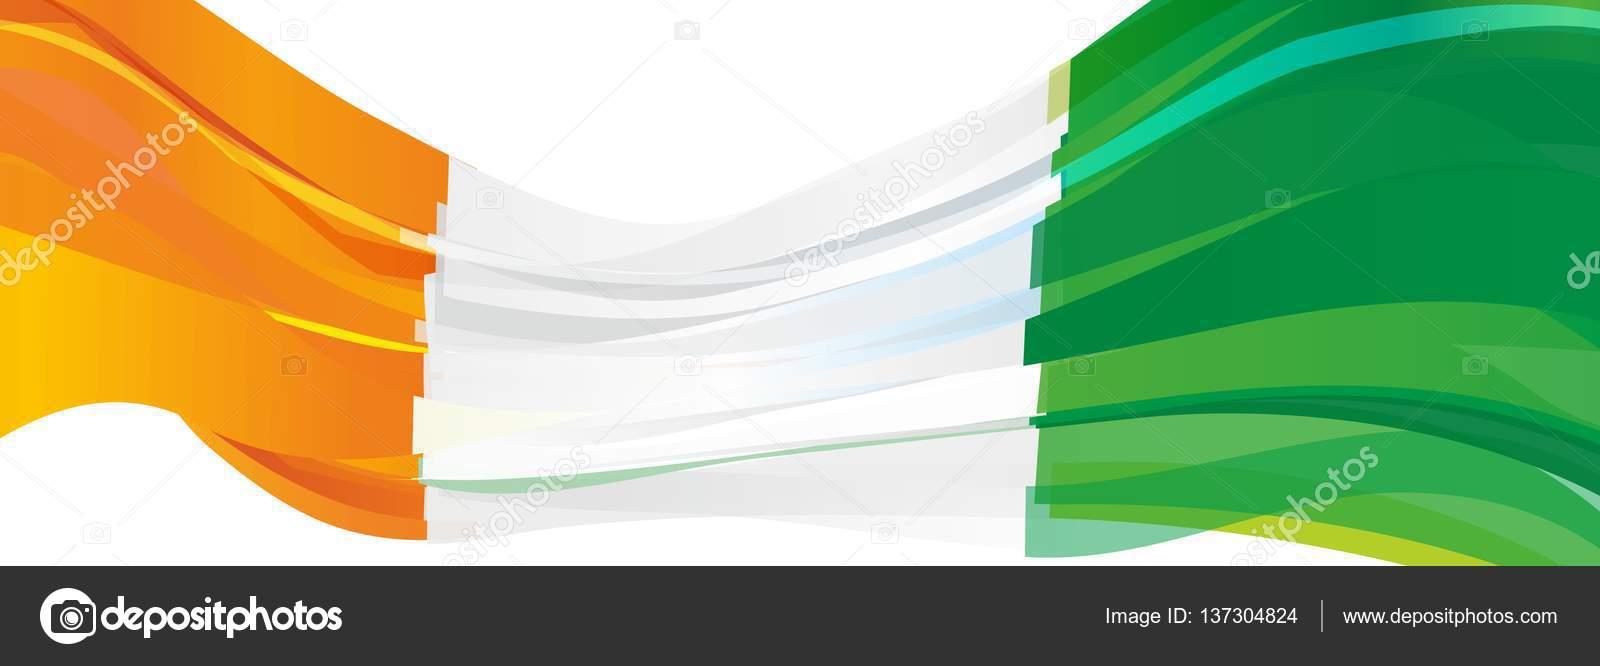 orange vit grön flagga